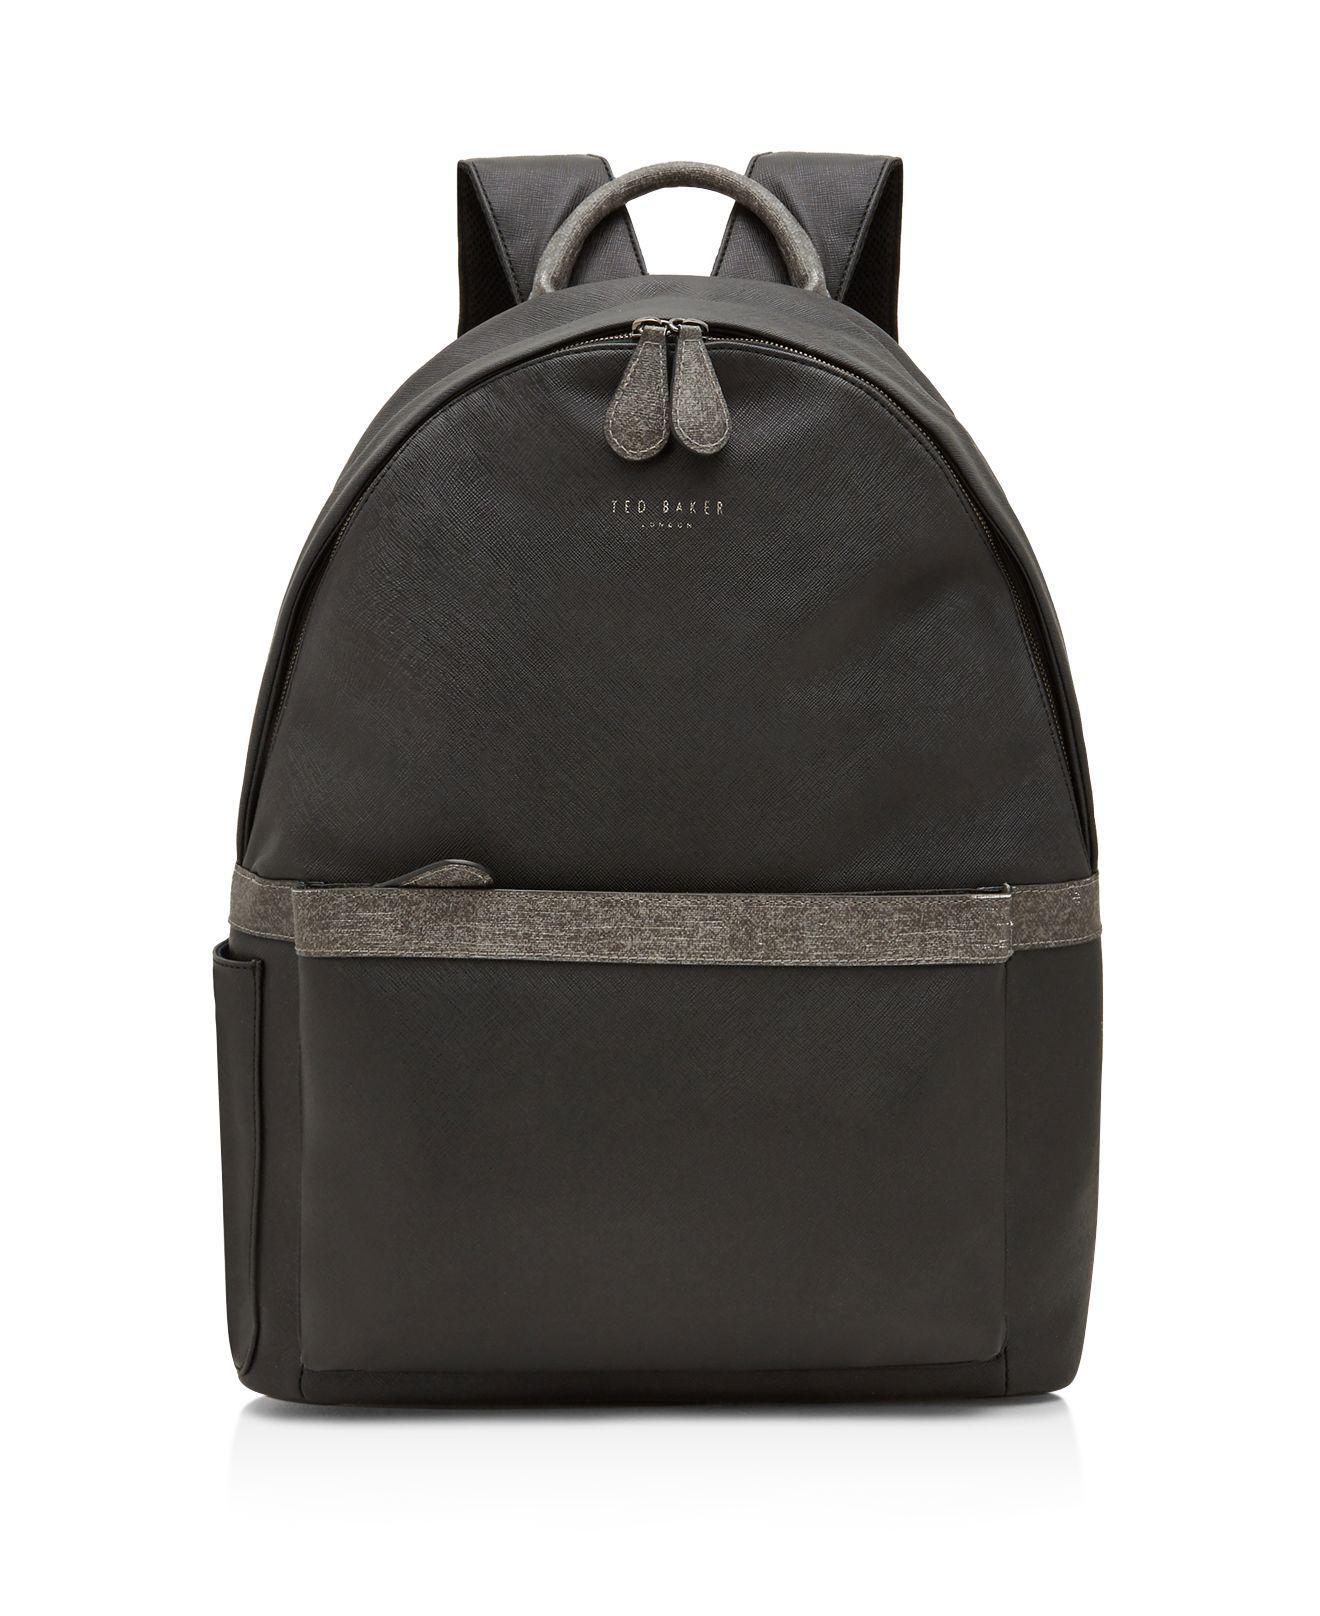 d76ad0f0eaea Lyst - Ted Baker Fangs Crossgrain Backpack in Black for Men